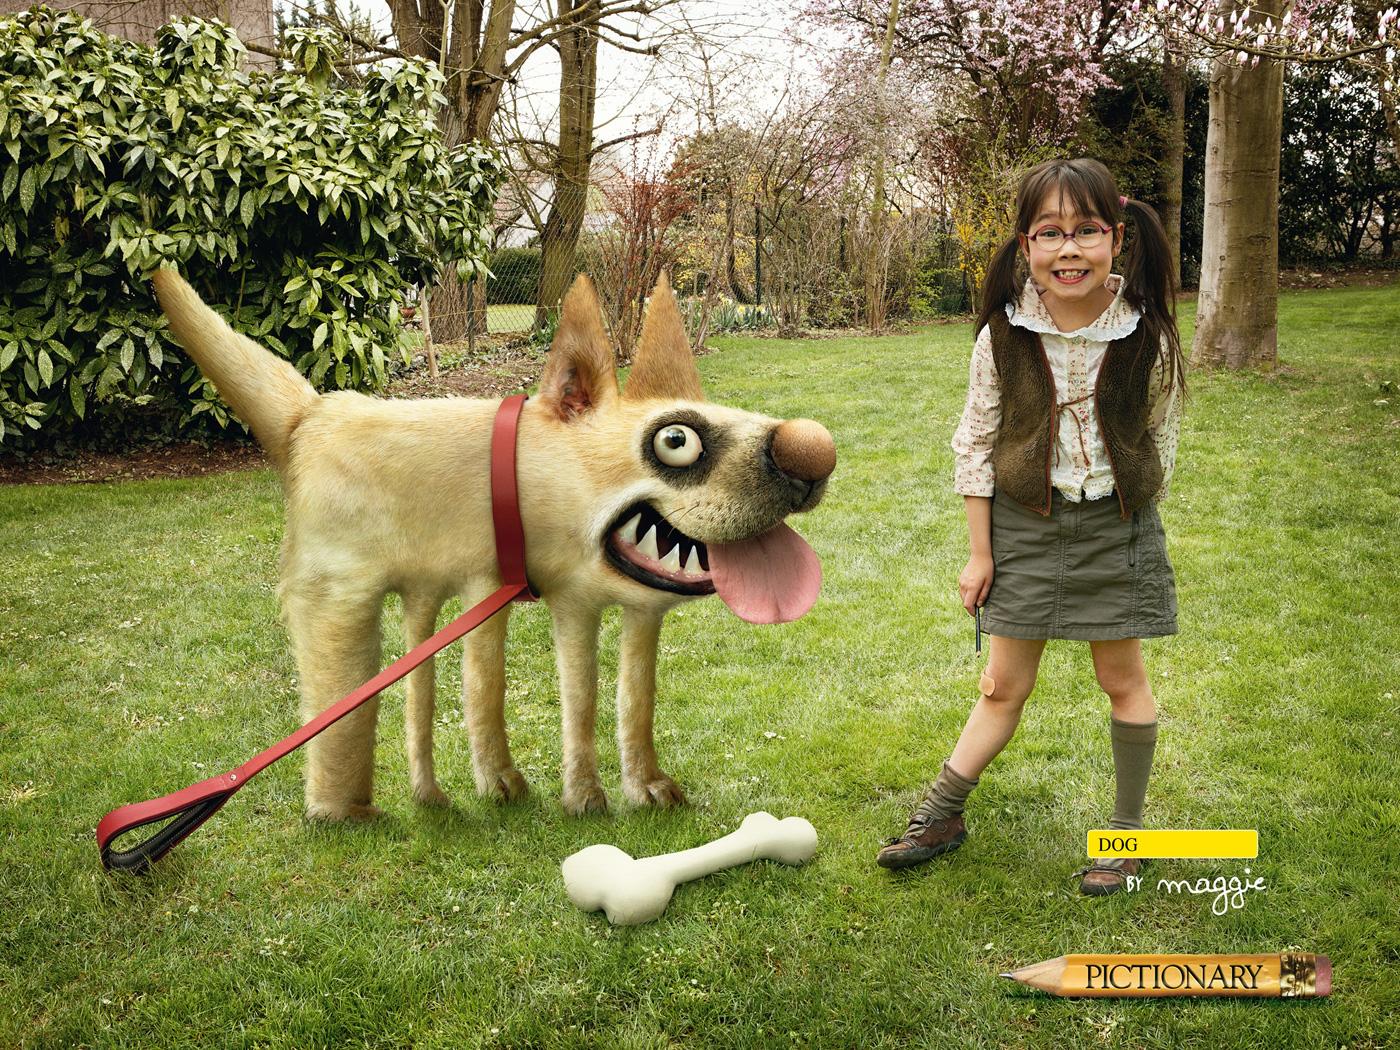 http://2.bp.blogspot.com/-ebMDy4EUaTM/TgRRvpExahI/AAAAAAAAAKw/Tc7zFOVK_90/s1600/Weird-Dog-o.jpg